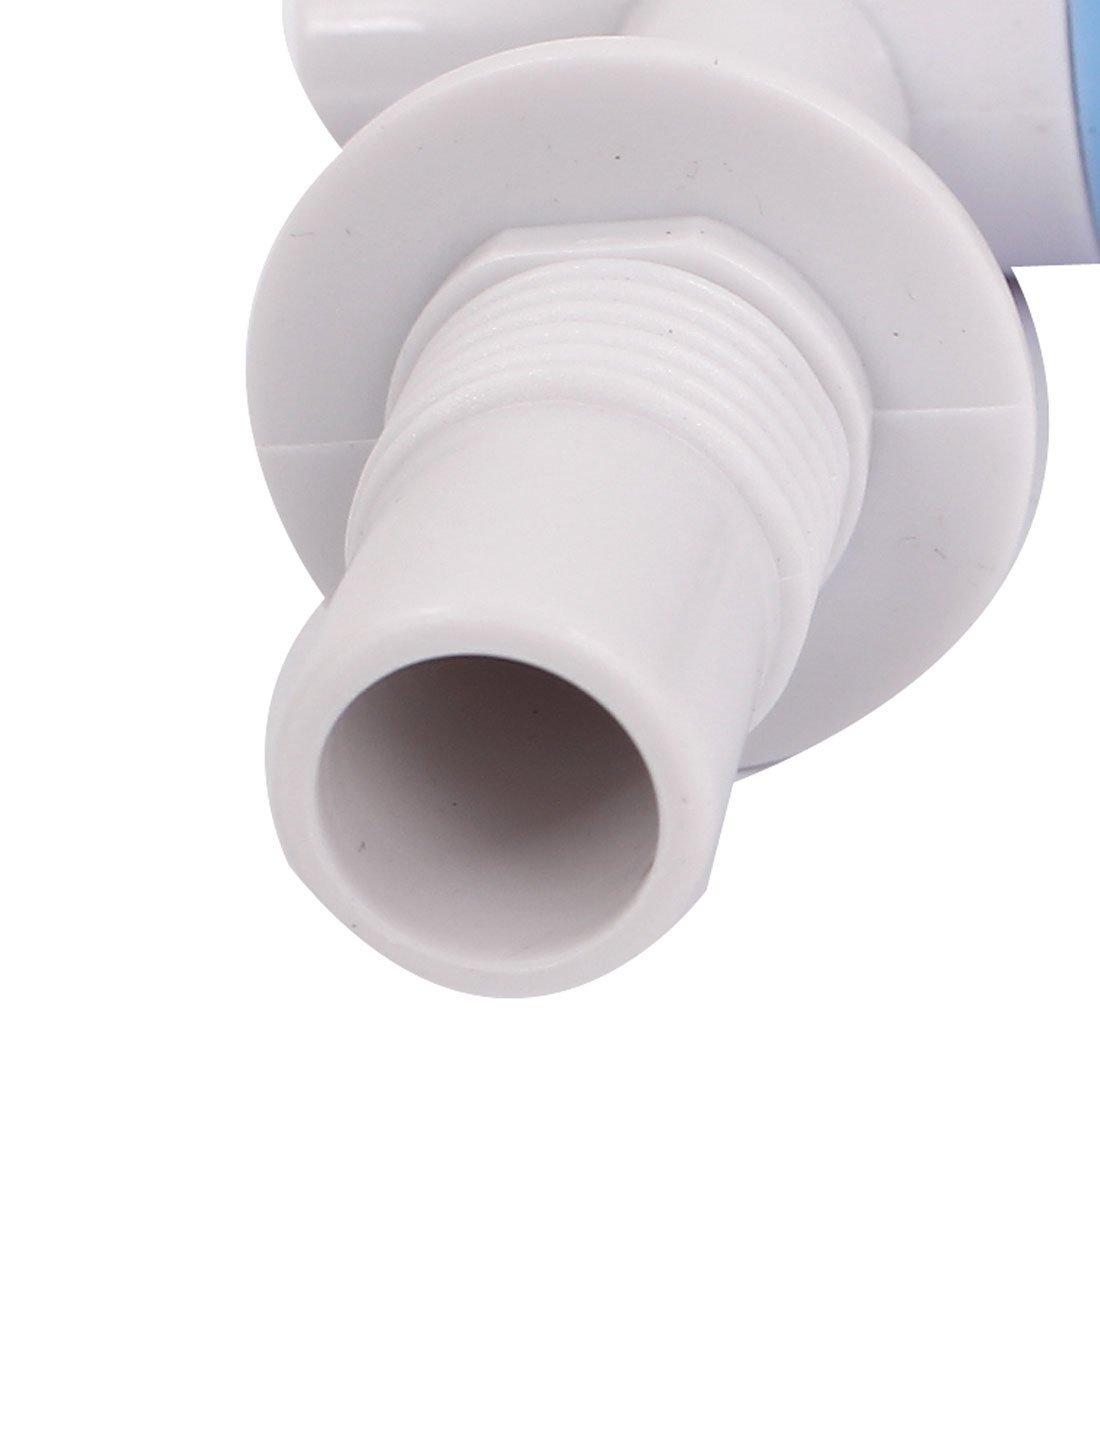 Plástico 21/32 pulgadas de diámetro rosca macho Grifo de agua del dispensador 2pcs - - Amazon.com